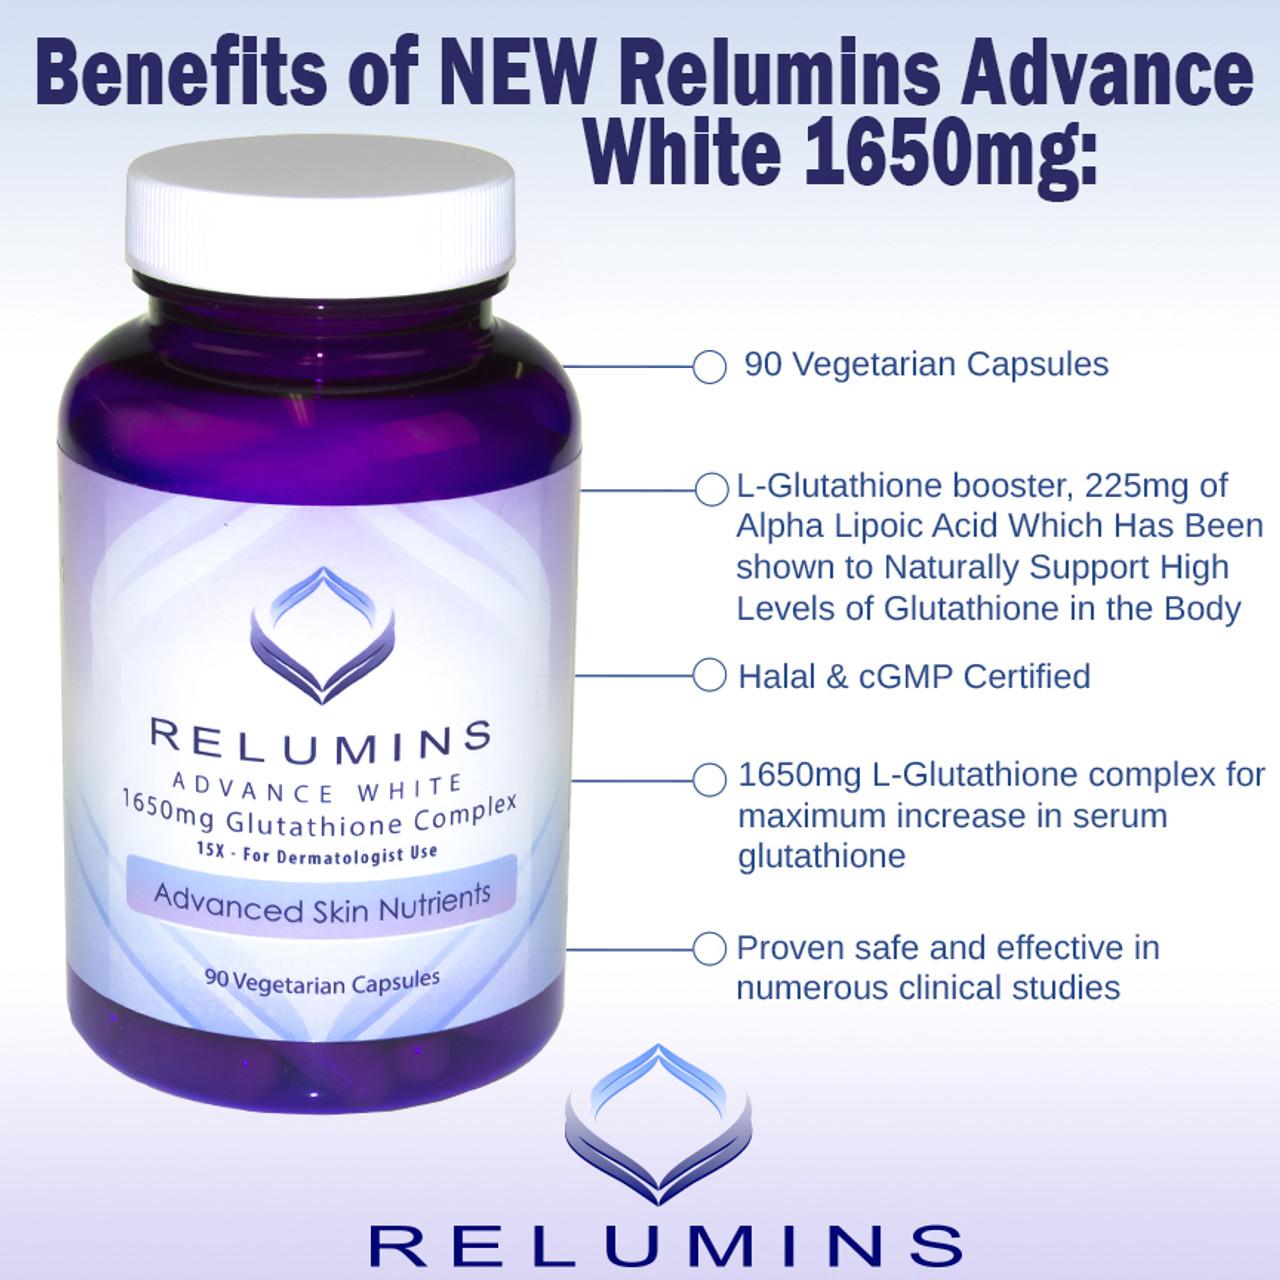 12x  RELUMINS ADVANCE WHITE 1650mg Glutathione Complex 15X – for DERMATOLOGIST USE